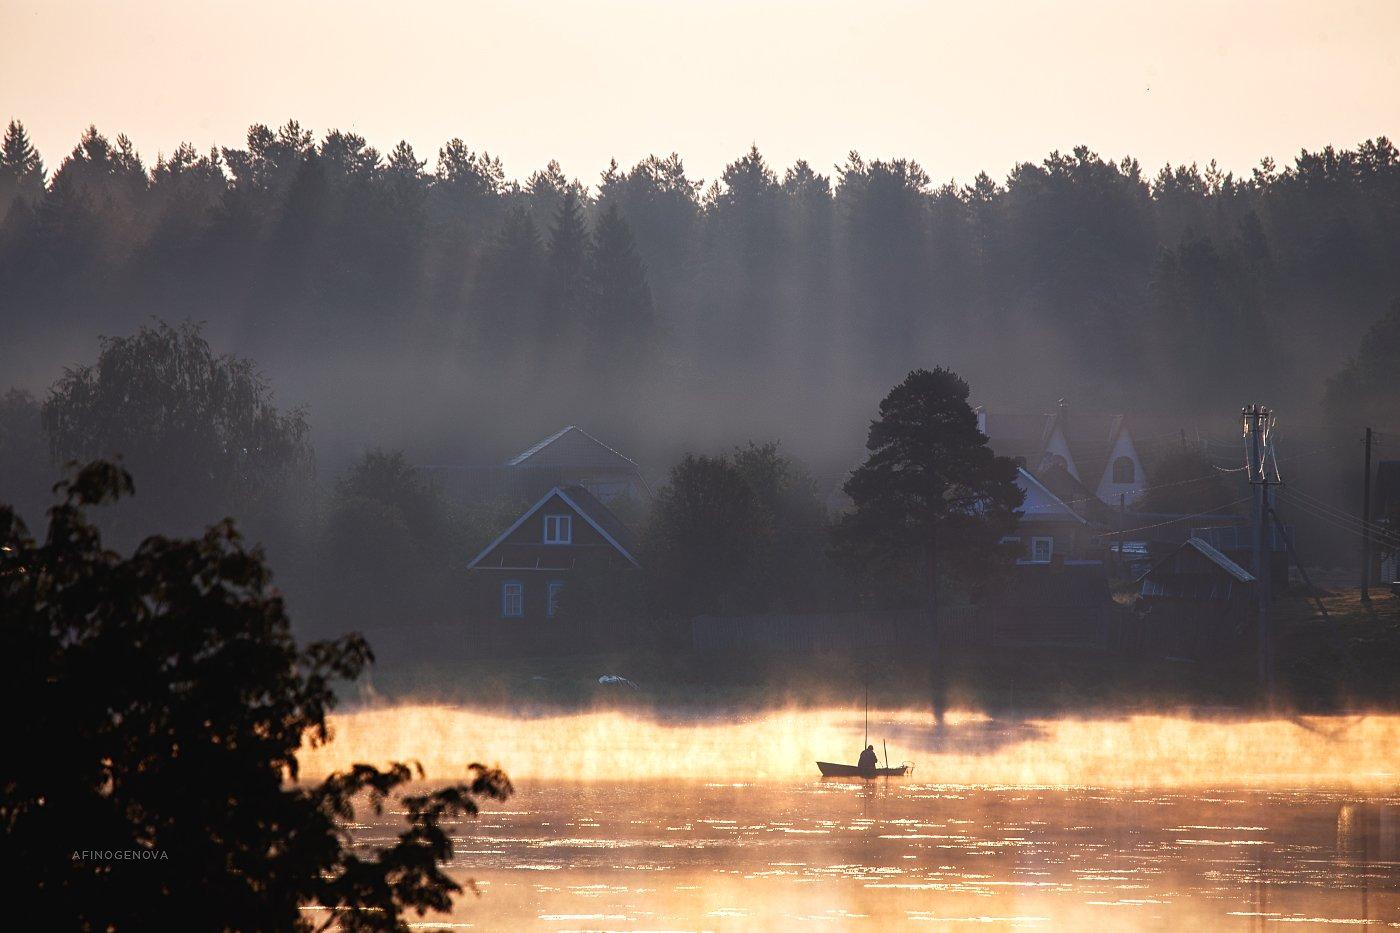 утро рассвет лодка рыбак лес, Афиногенова Татьяна